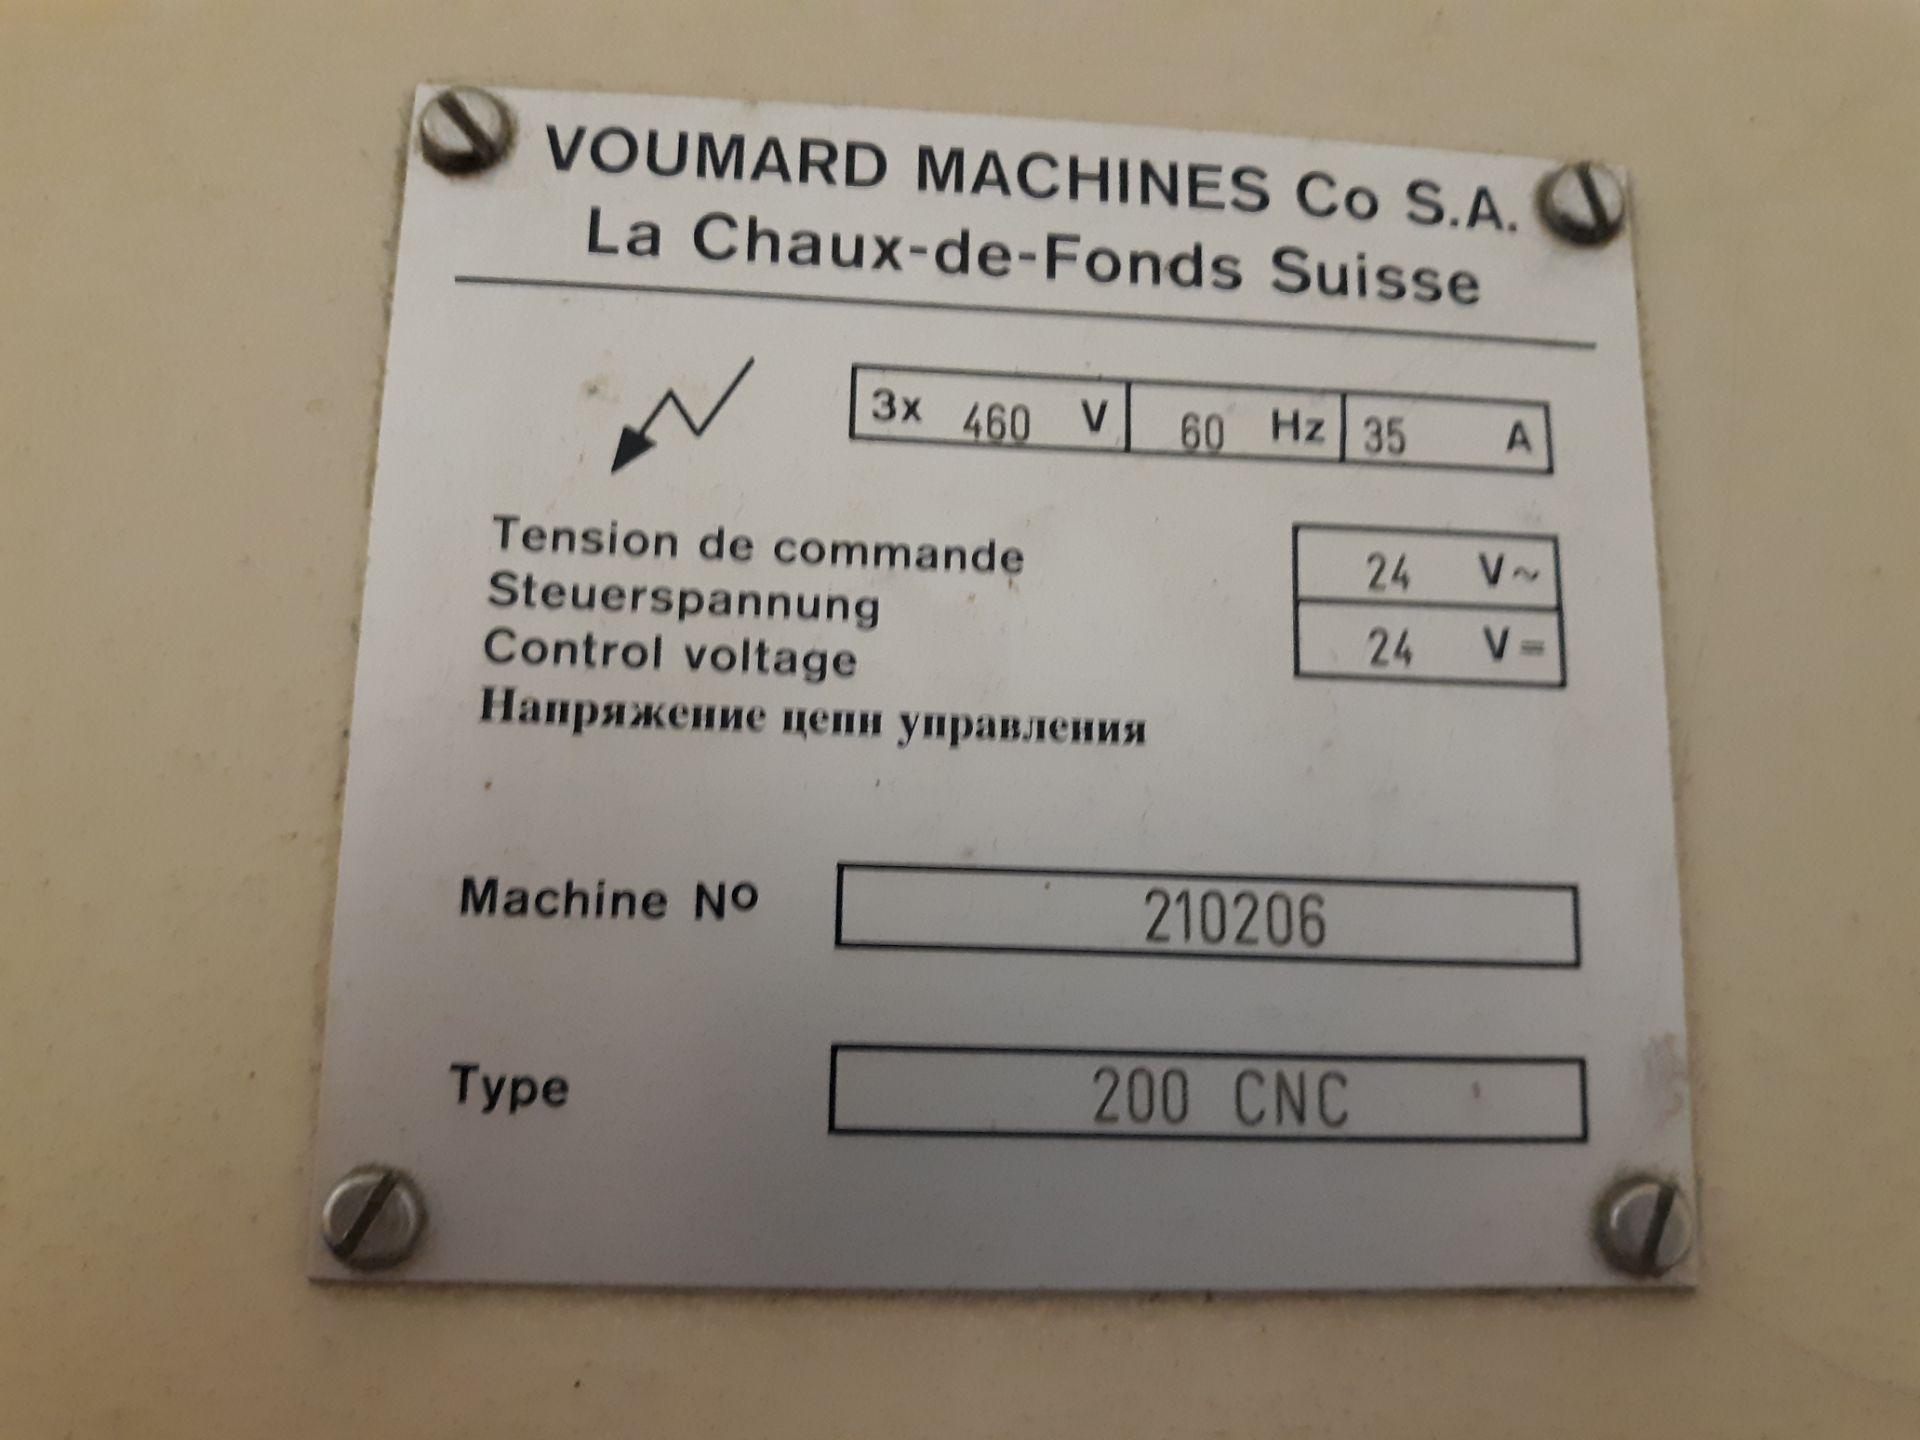 Lot 44 - VOUMARD MACHINE CONTROL CABINET TYPE-200 CNC MACHINE#210206 RIGGING FEE: $10